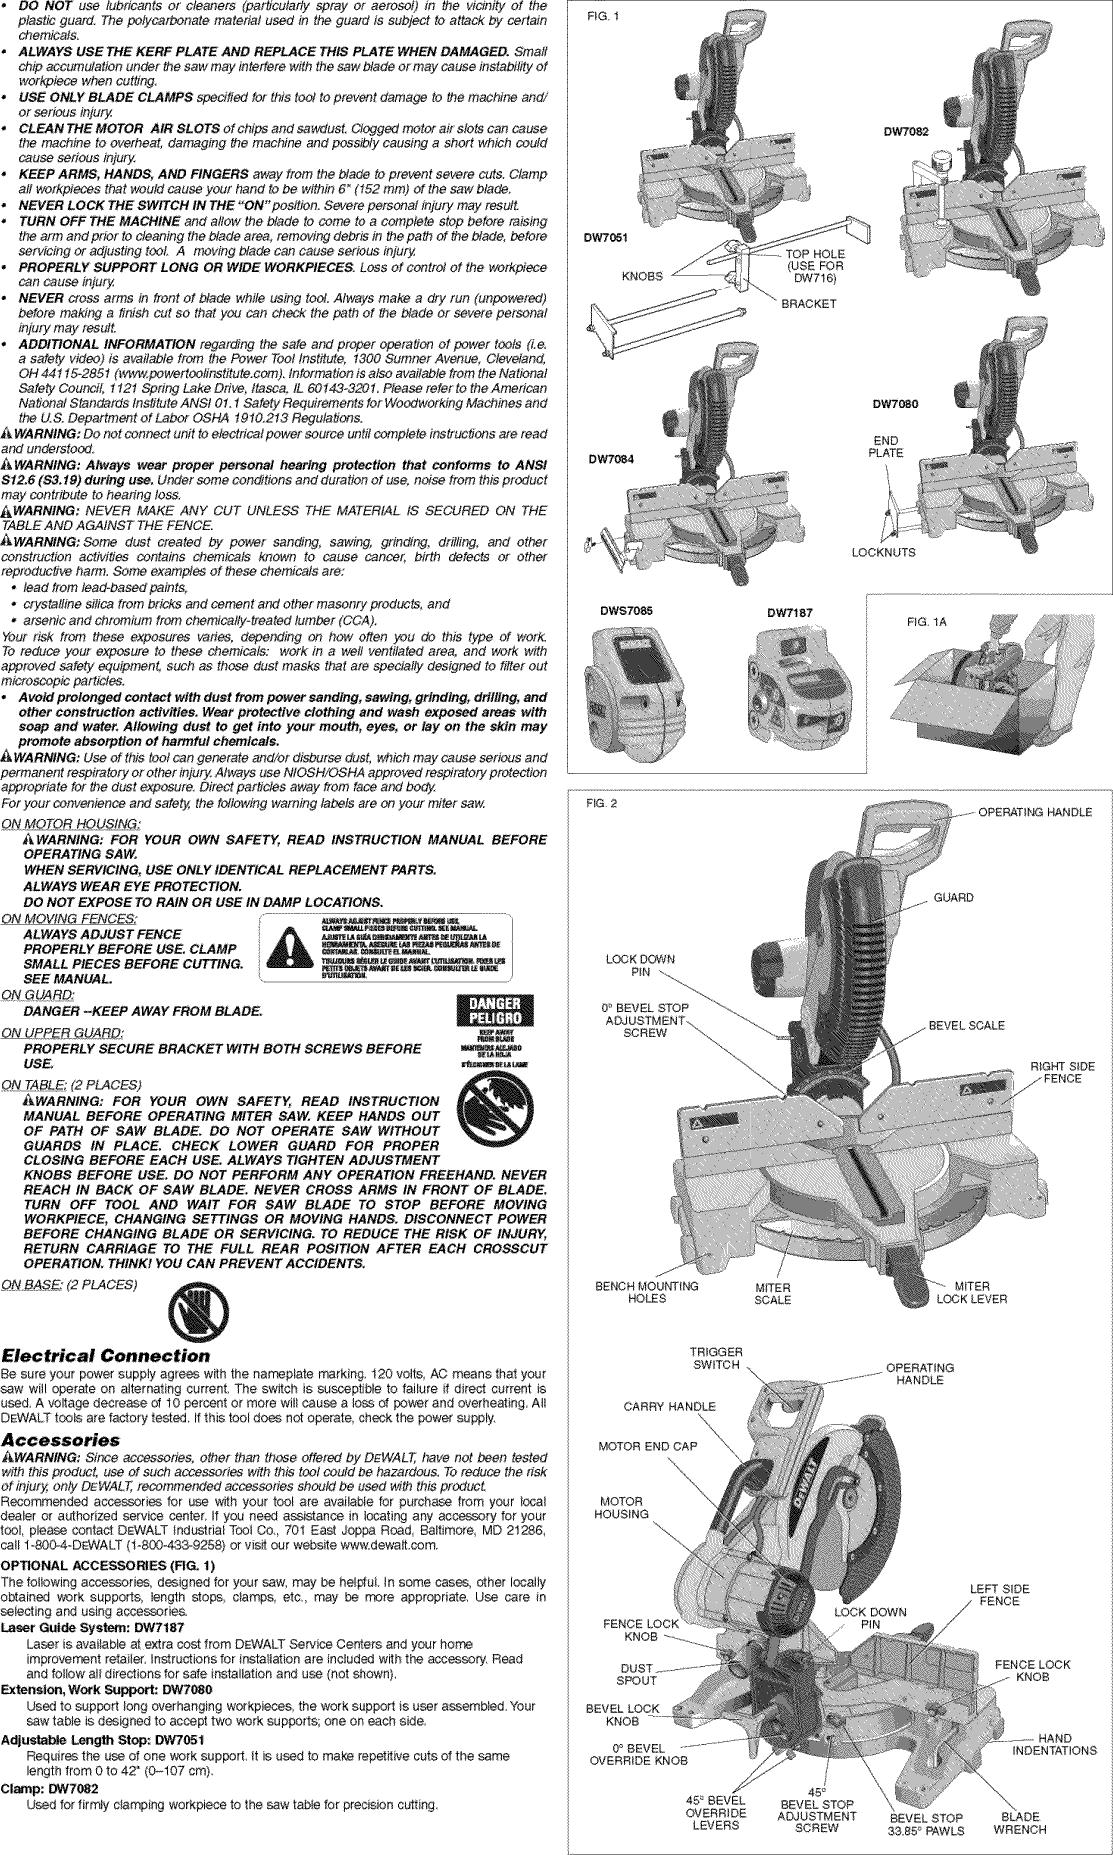 Dewalt DW716 TYPE3 User Manual MITER SAW Manuals And Guides